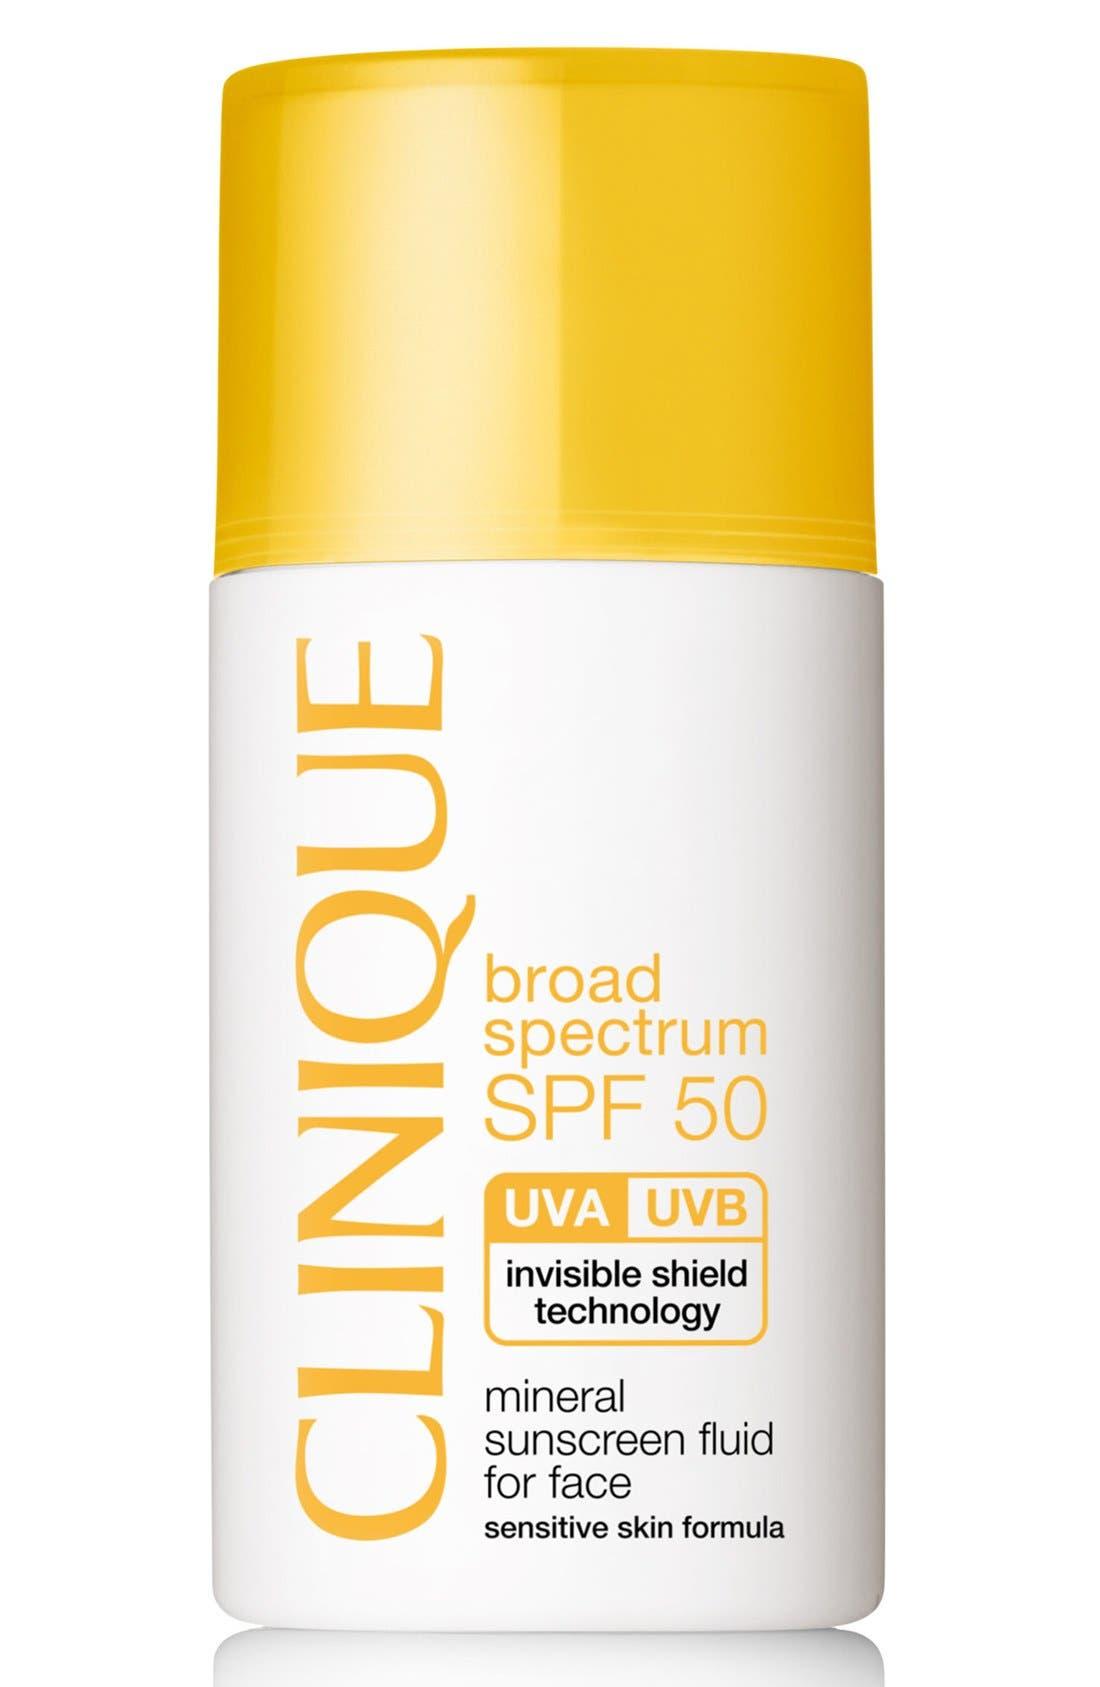 Broad Spectrum SPF 50 Mineral Sunscreen Fluid for Face | Nordstrom